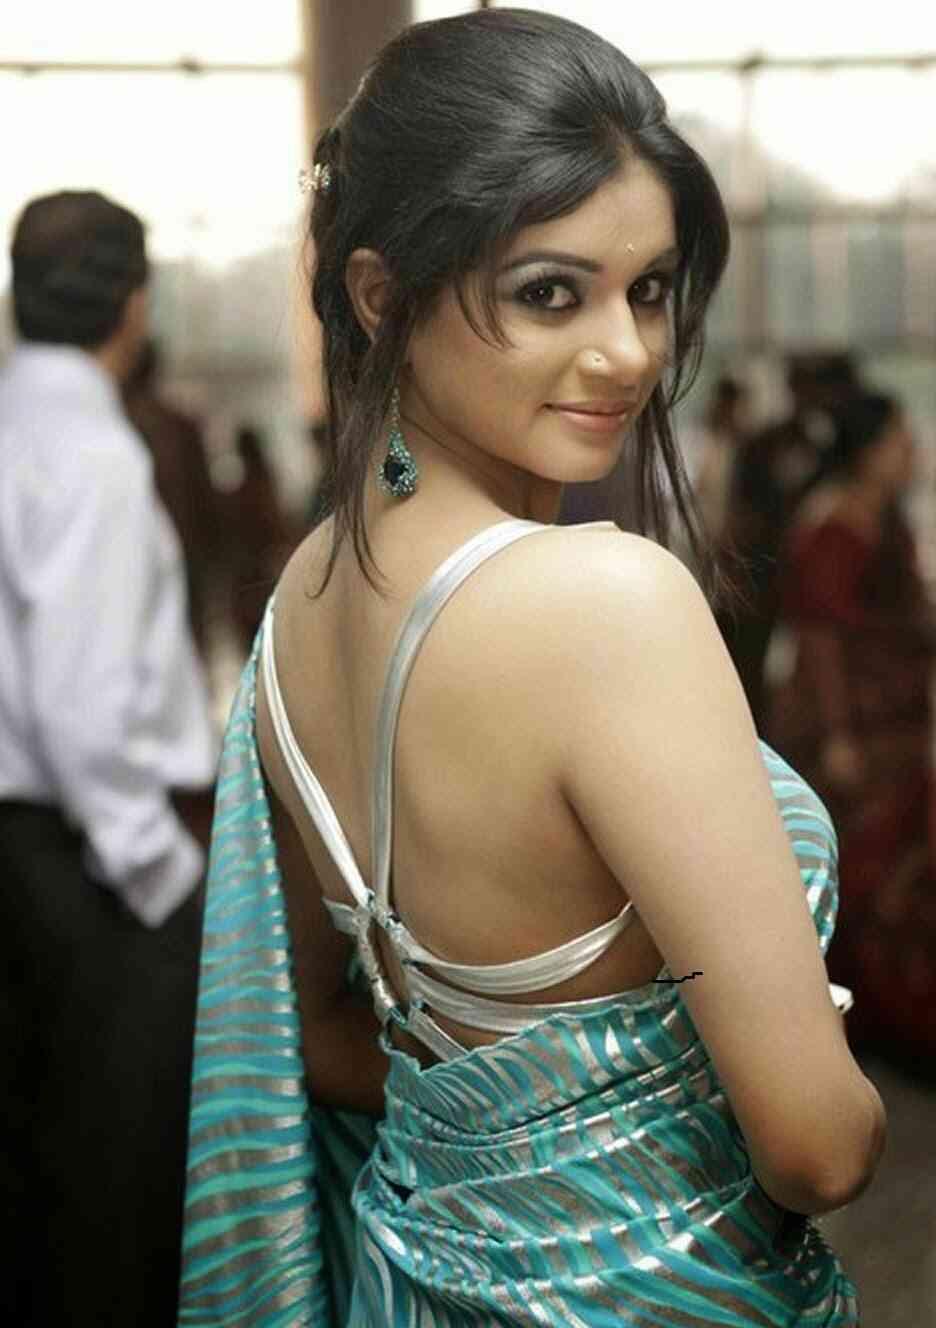 bangladeshi-girls-hot-pic-braless-tits